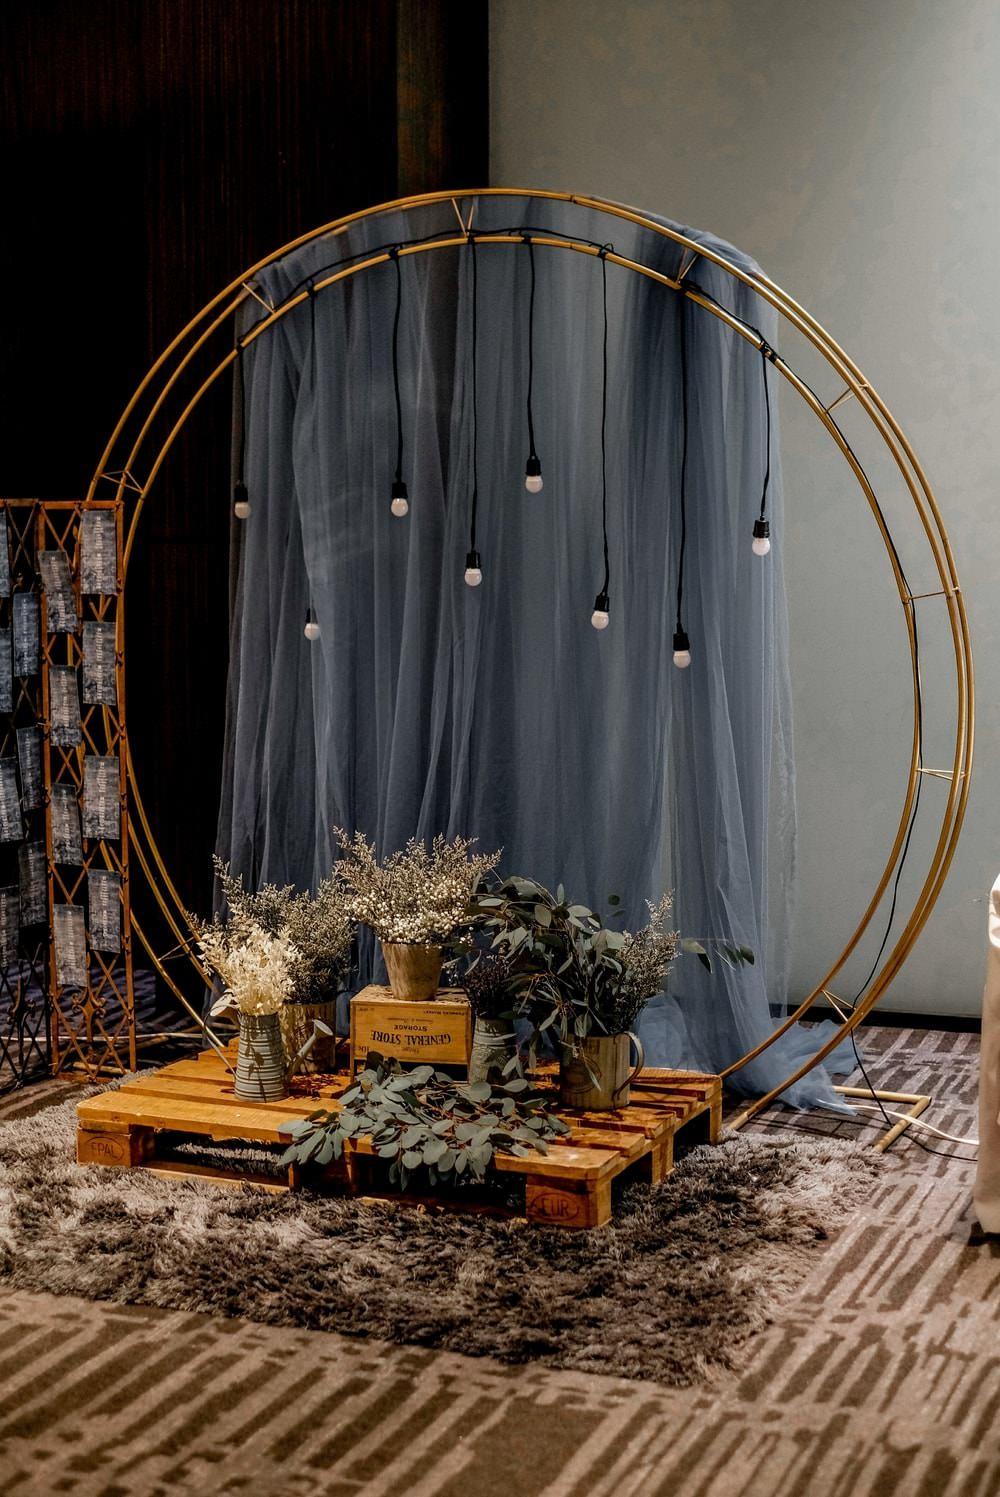 Hoop Backdrop Festoon Lights Fabric Flowers Philippines Wedding The Backyard Studios